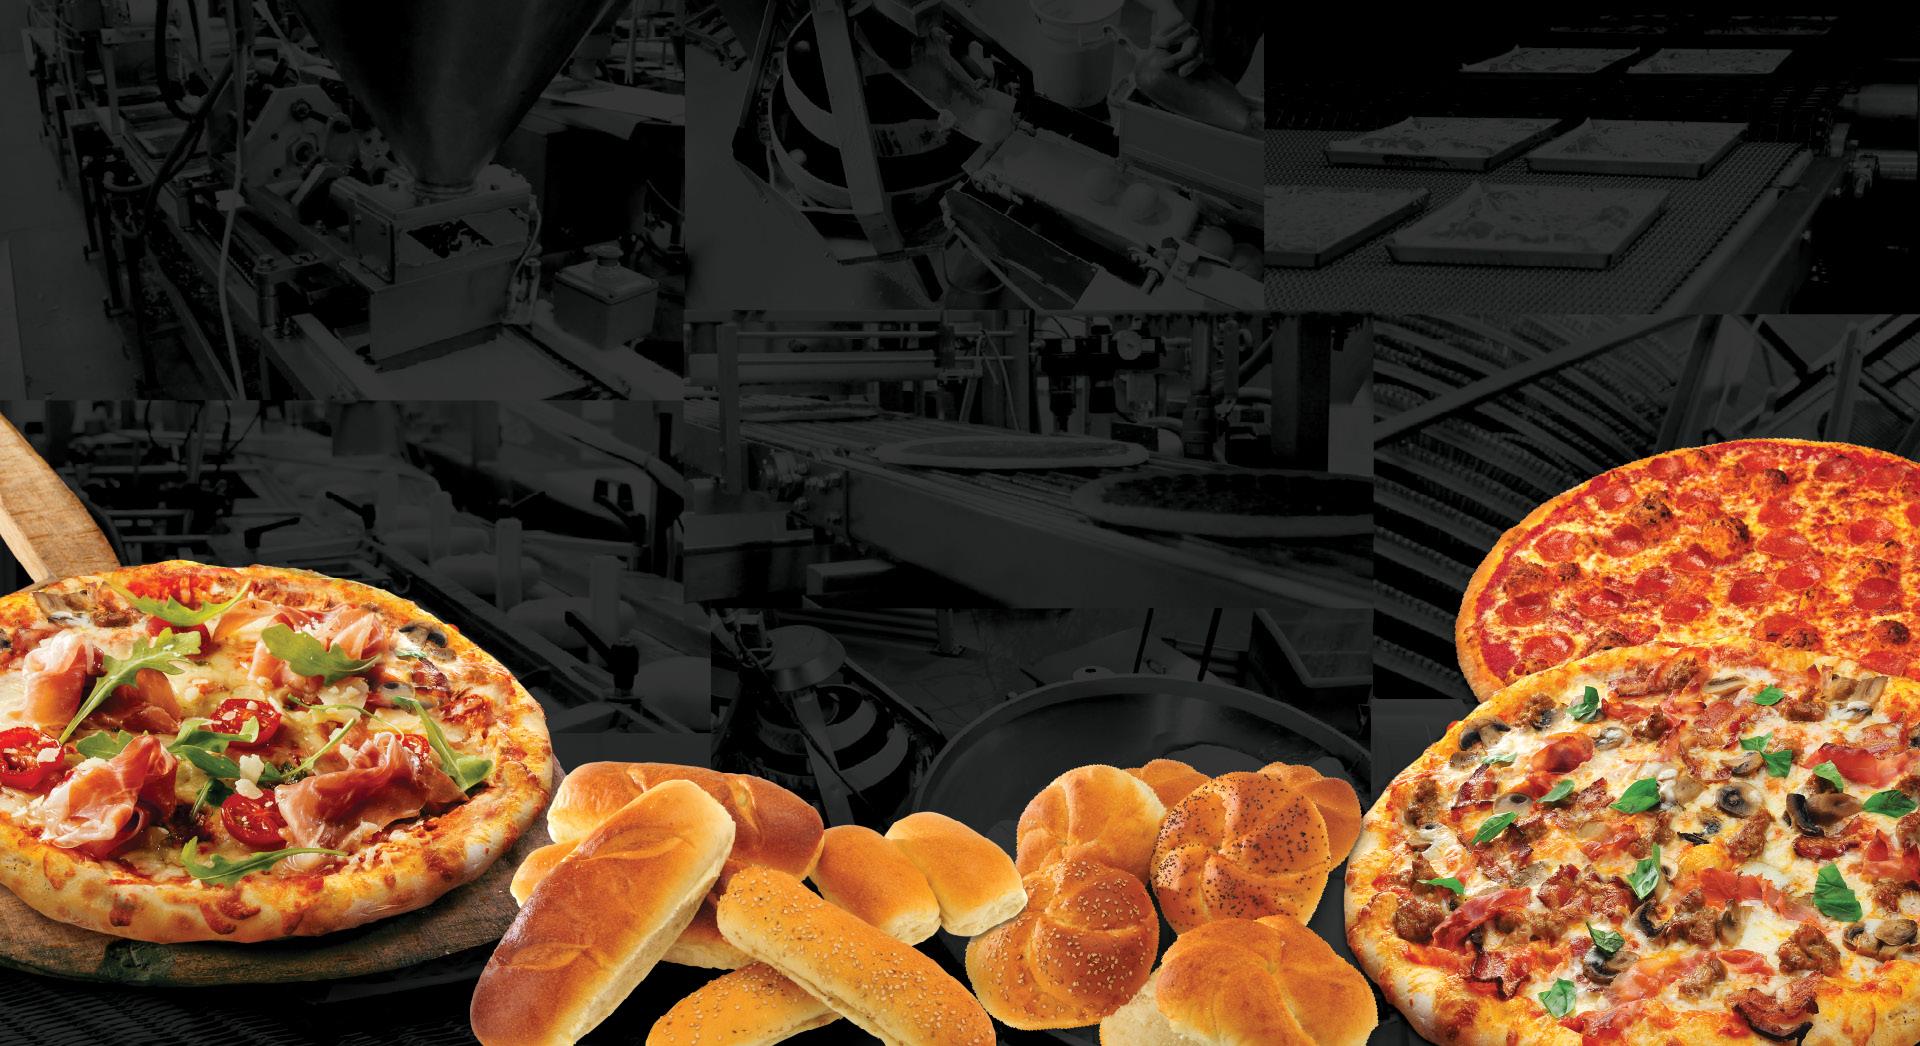 Bread, Rolls, Pizza Dough, Topped Pizza